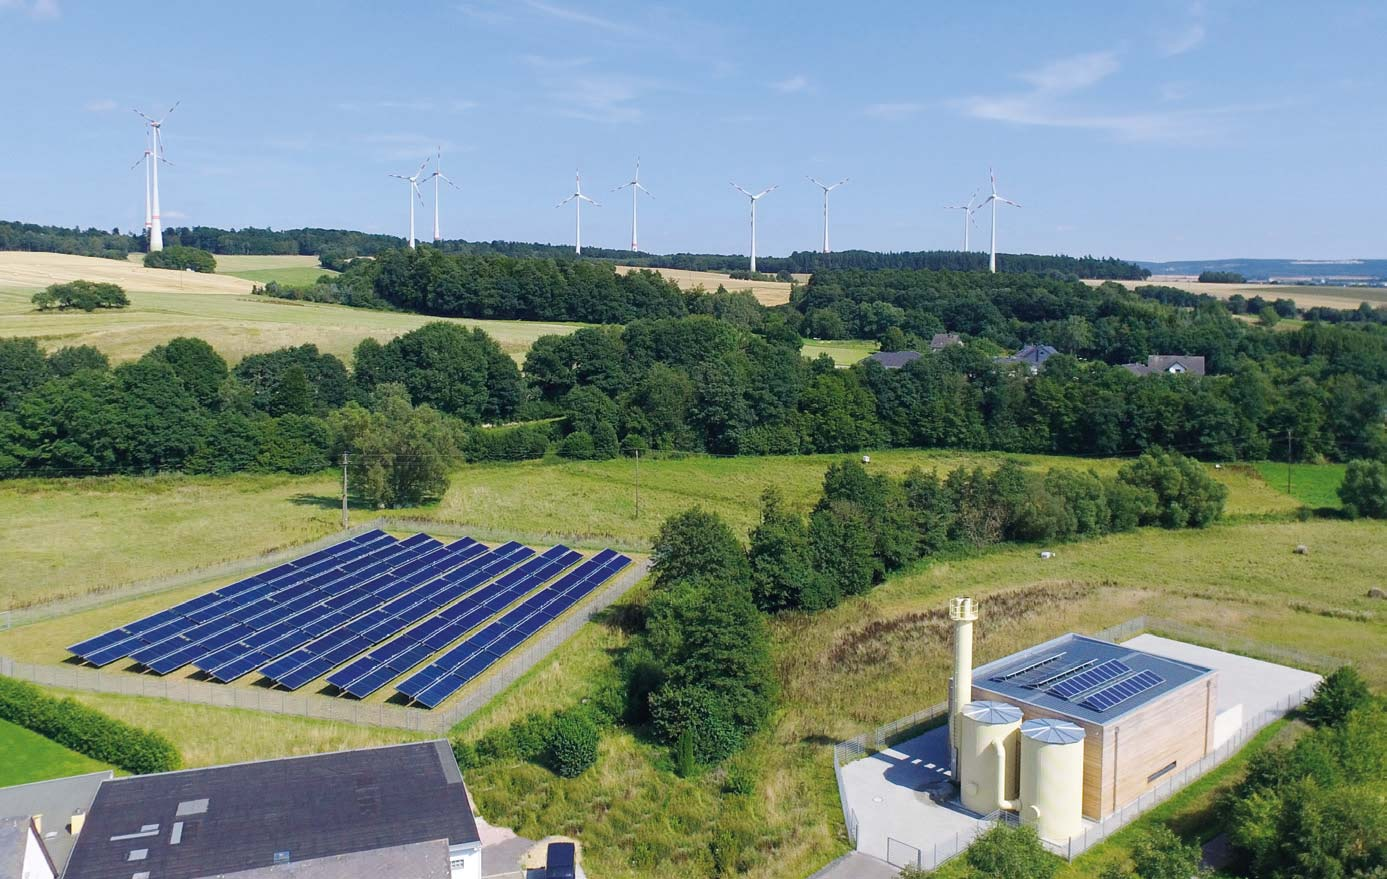 kuelz-solaranlage-waermenetz-